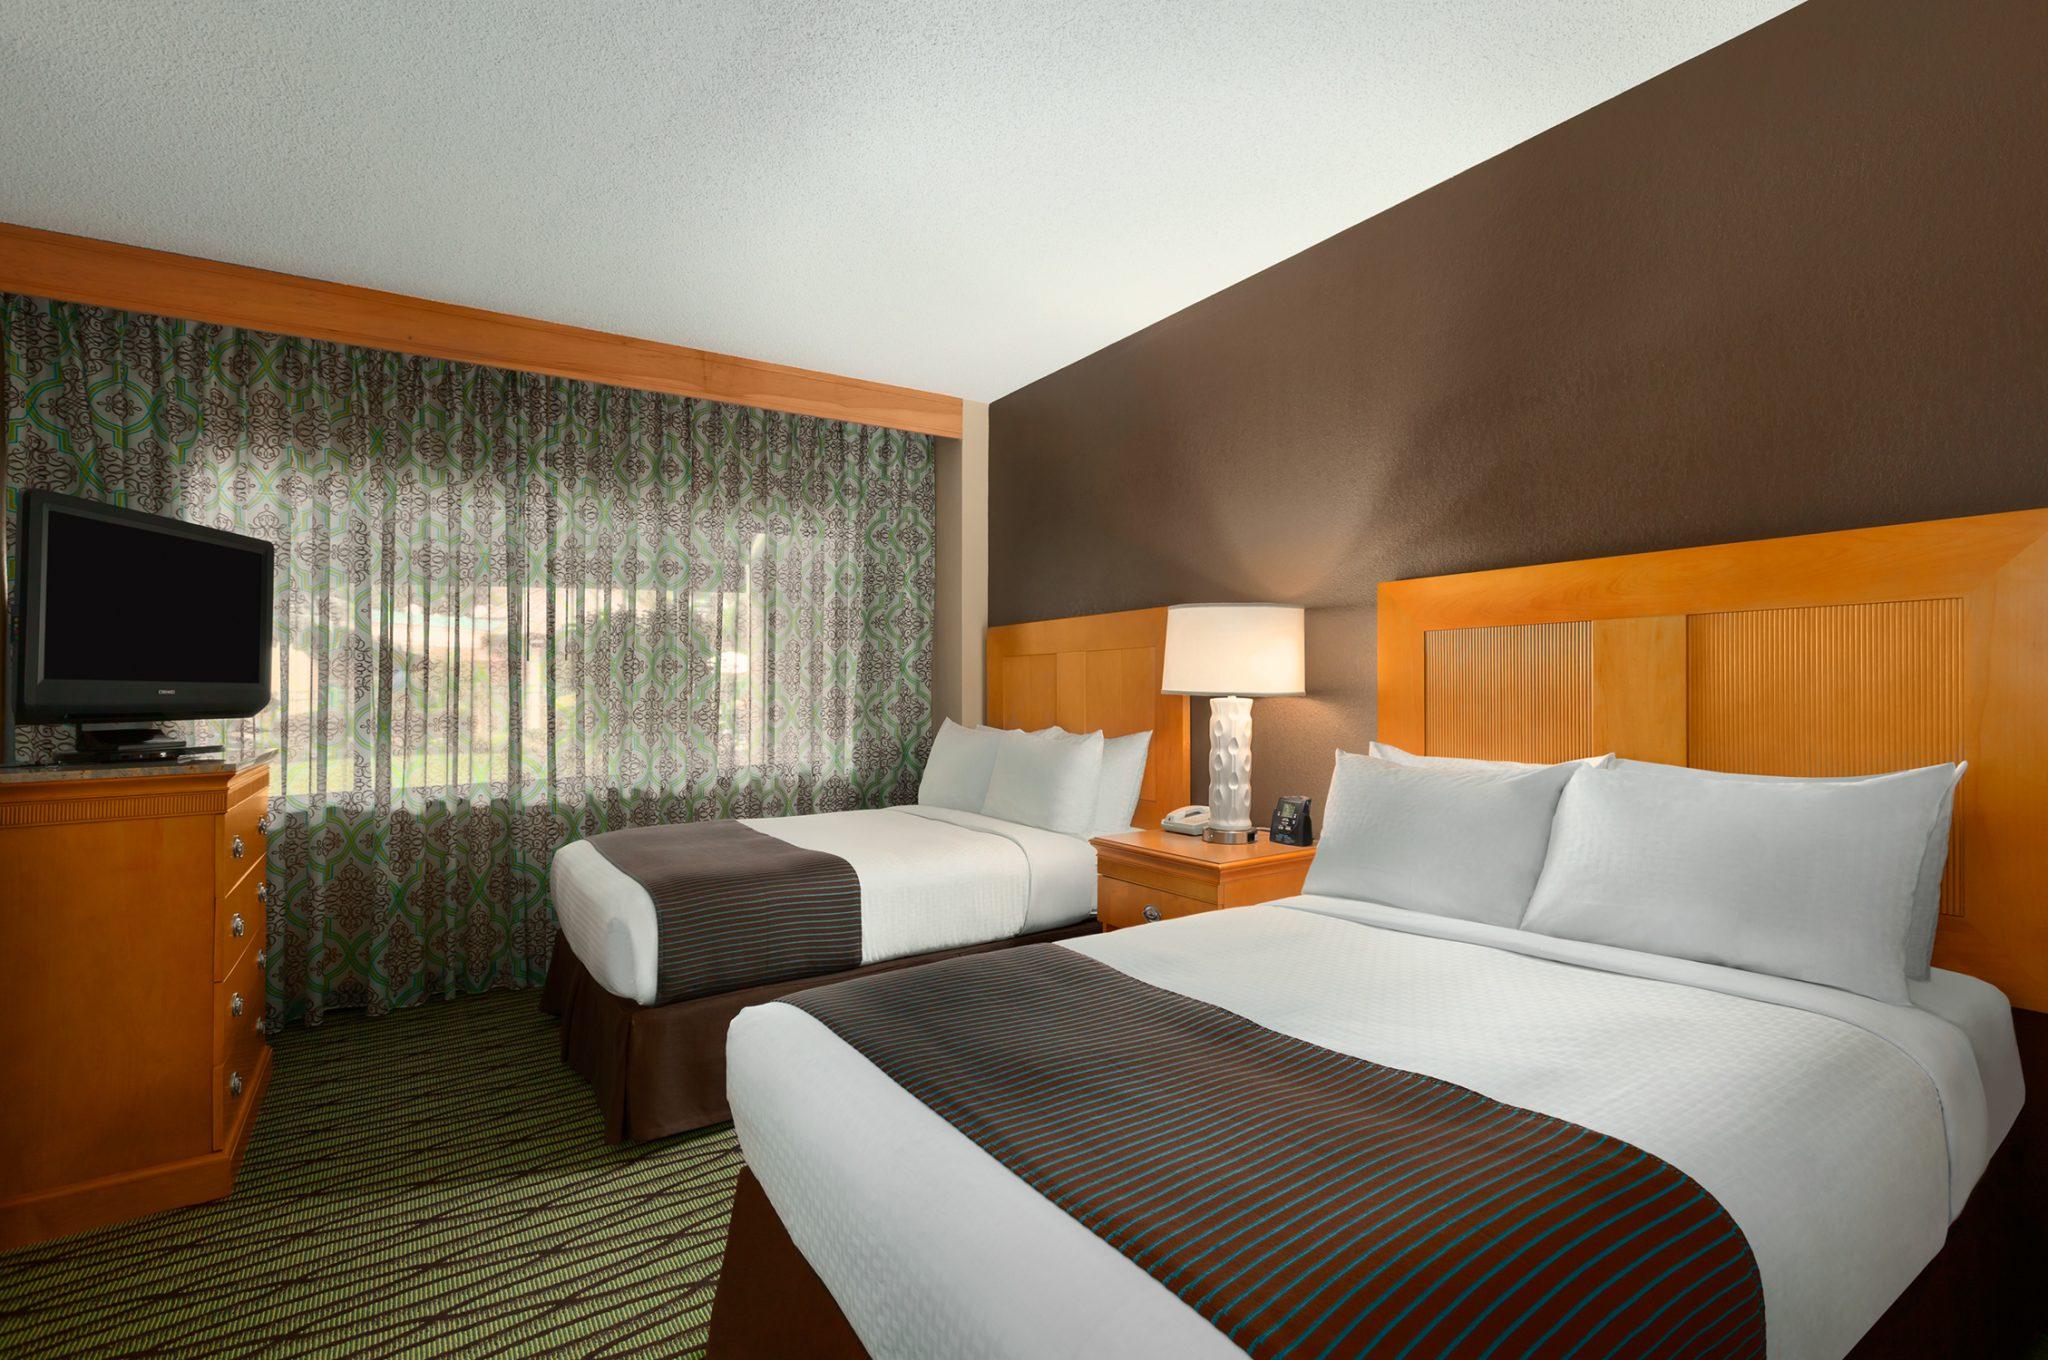 Doubletree-LBV-room-interior_2